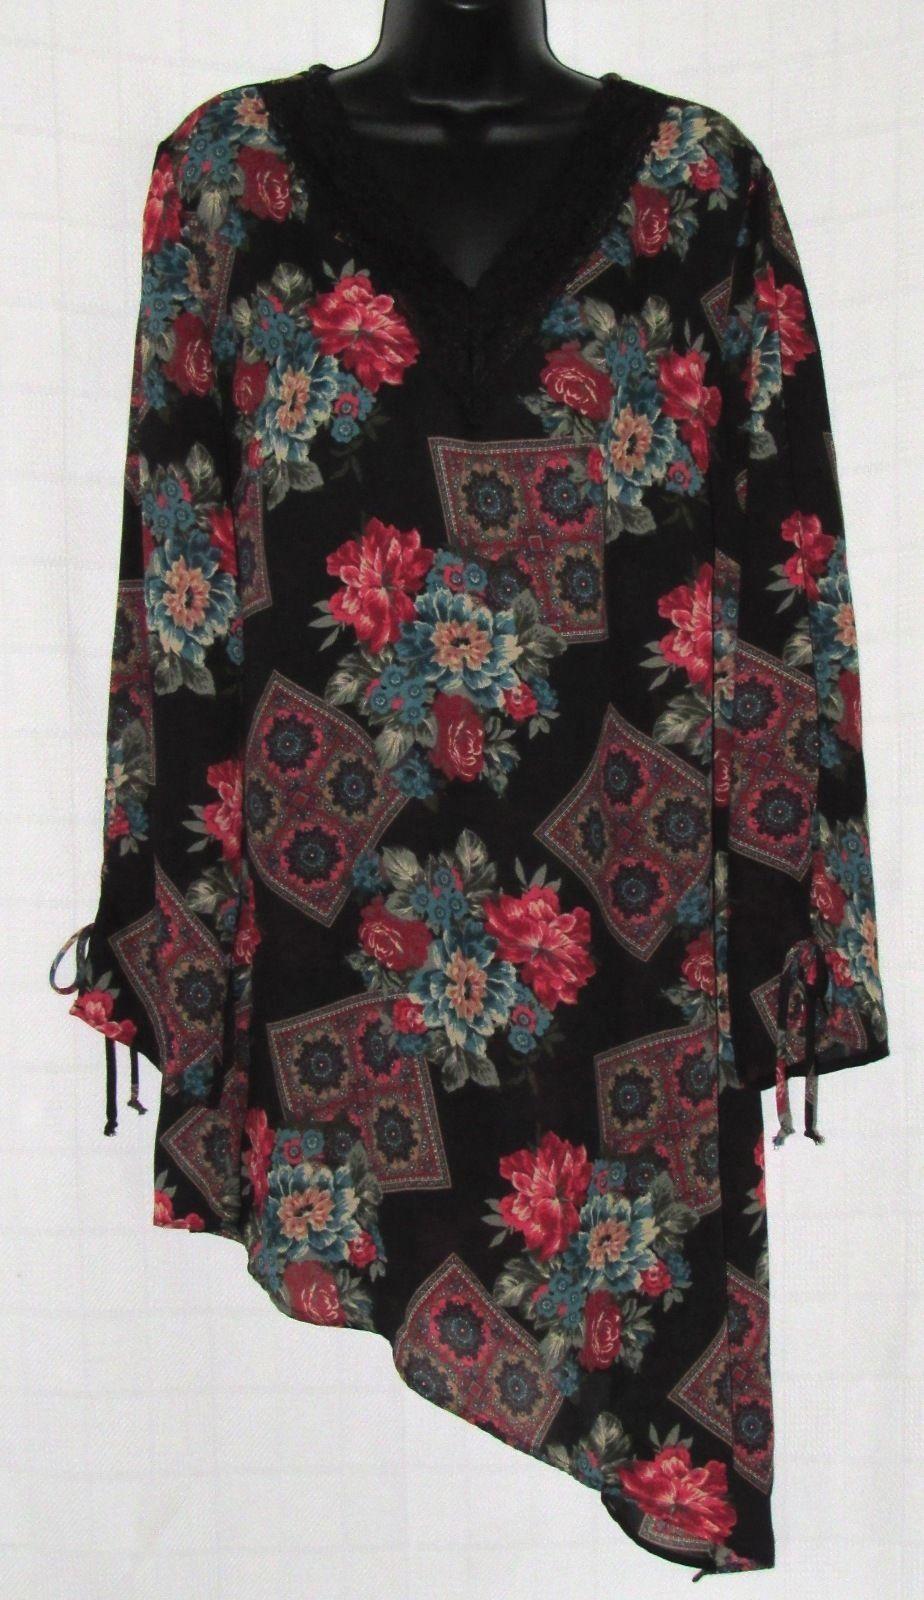 Black Floral Print Sheer Lace Trim Nightgown with Asymmetrical Hem